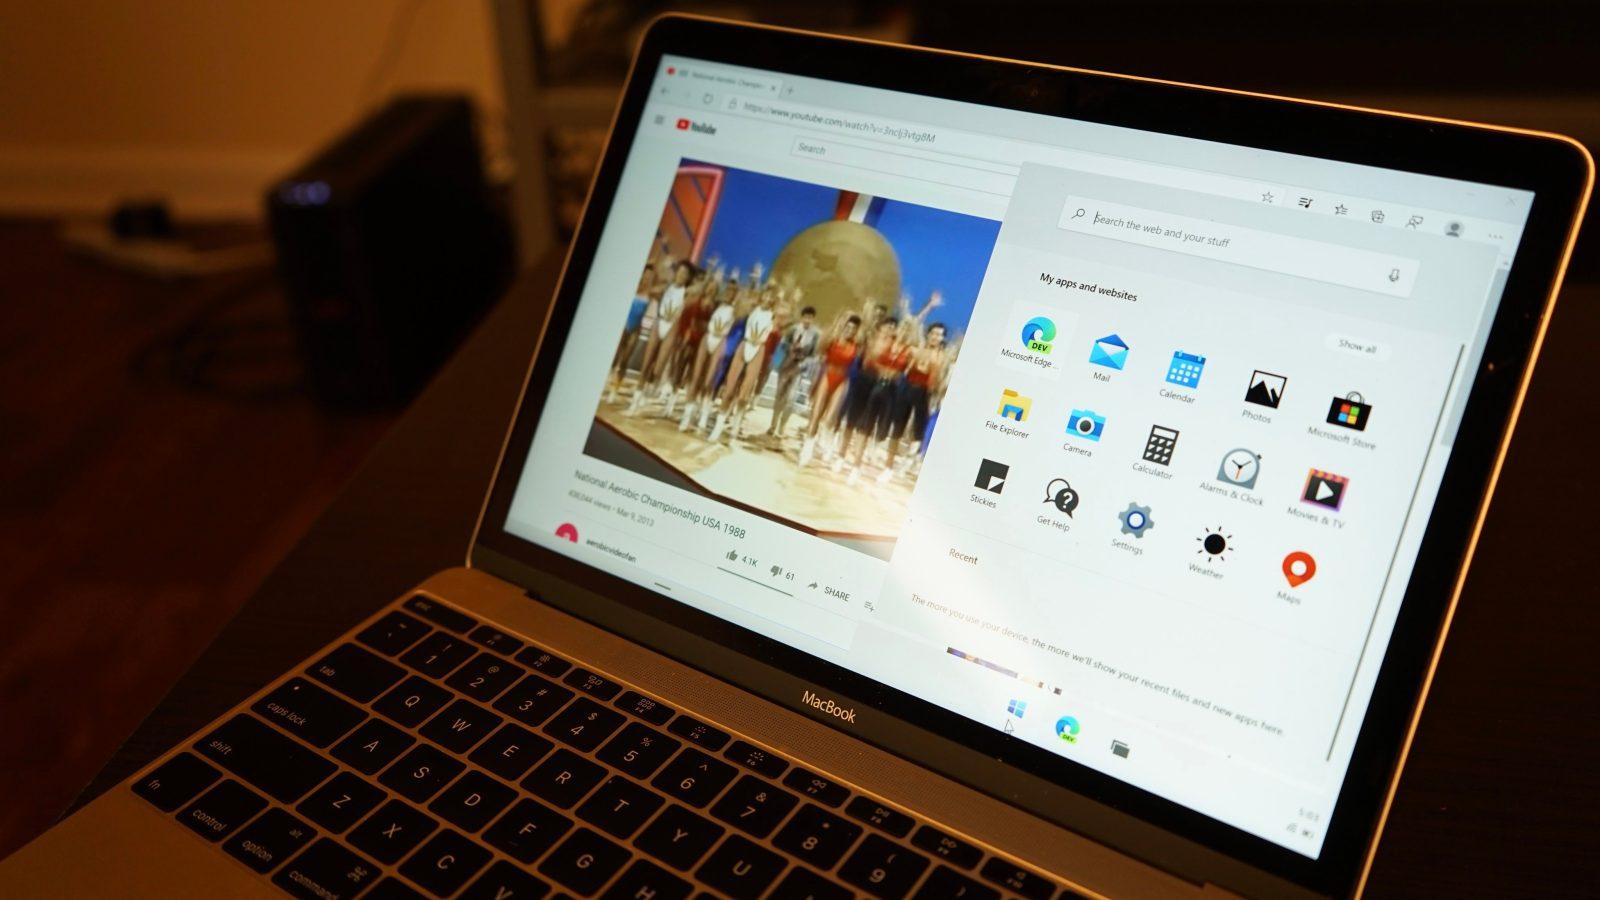 Developer successfully installs Microsoft's new dual-screen Windows 10X OS on a MacBook